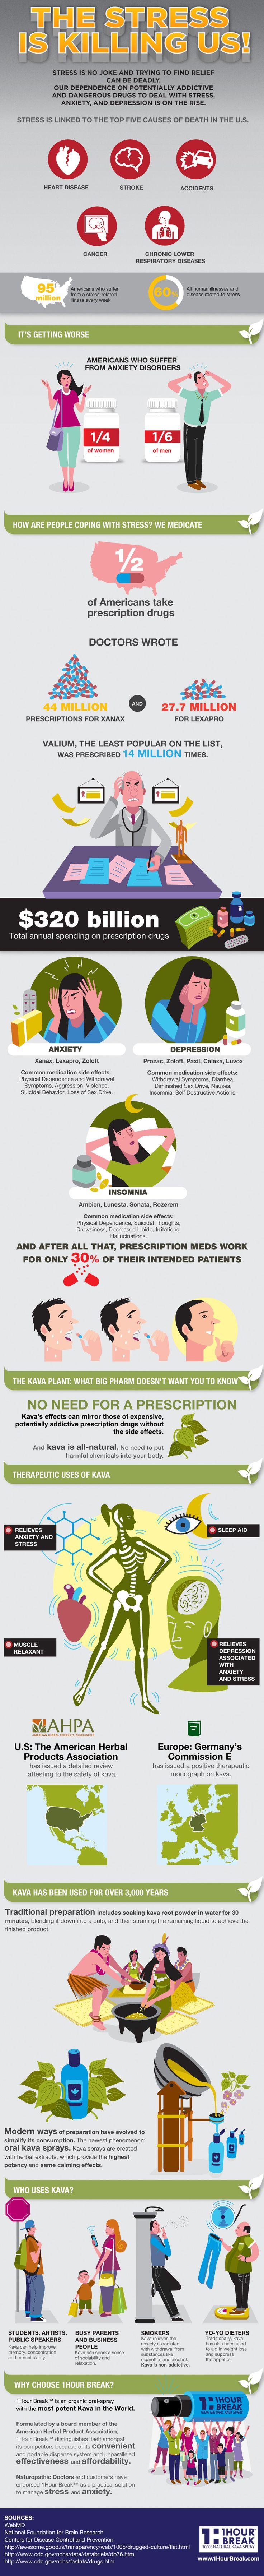 kava kava, anxiety spray, Prescription medication, xanax, valium, ativan, lexapro, war on drugs, stress is killing us,